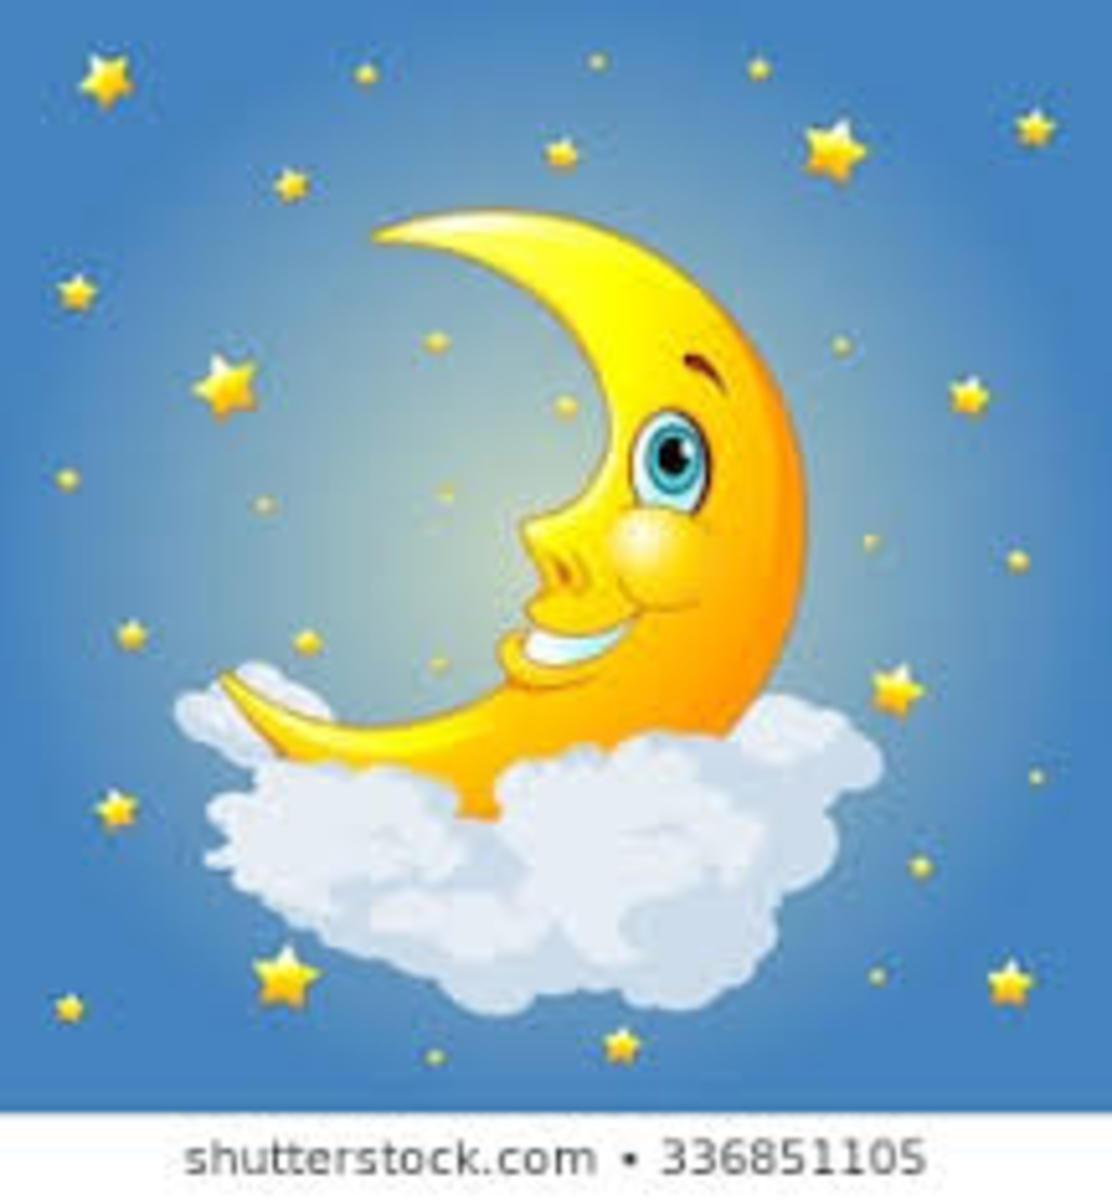 Moon Shine--a Kids Poem